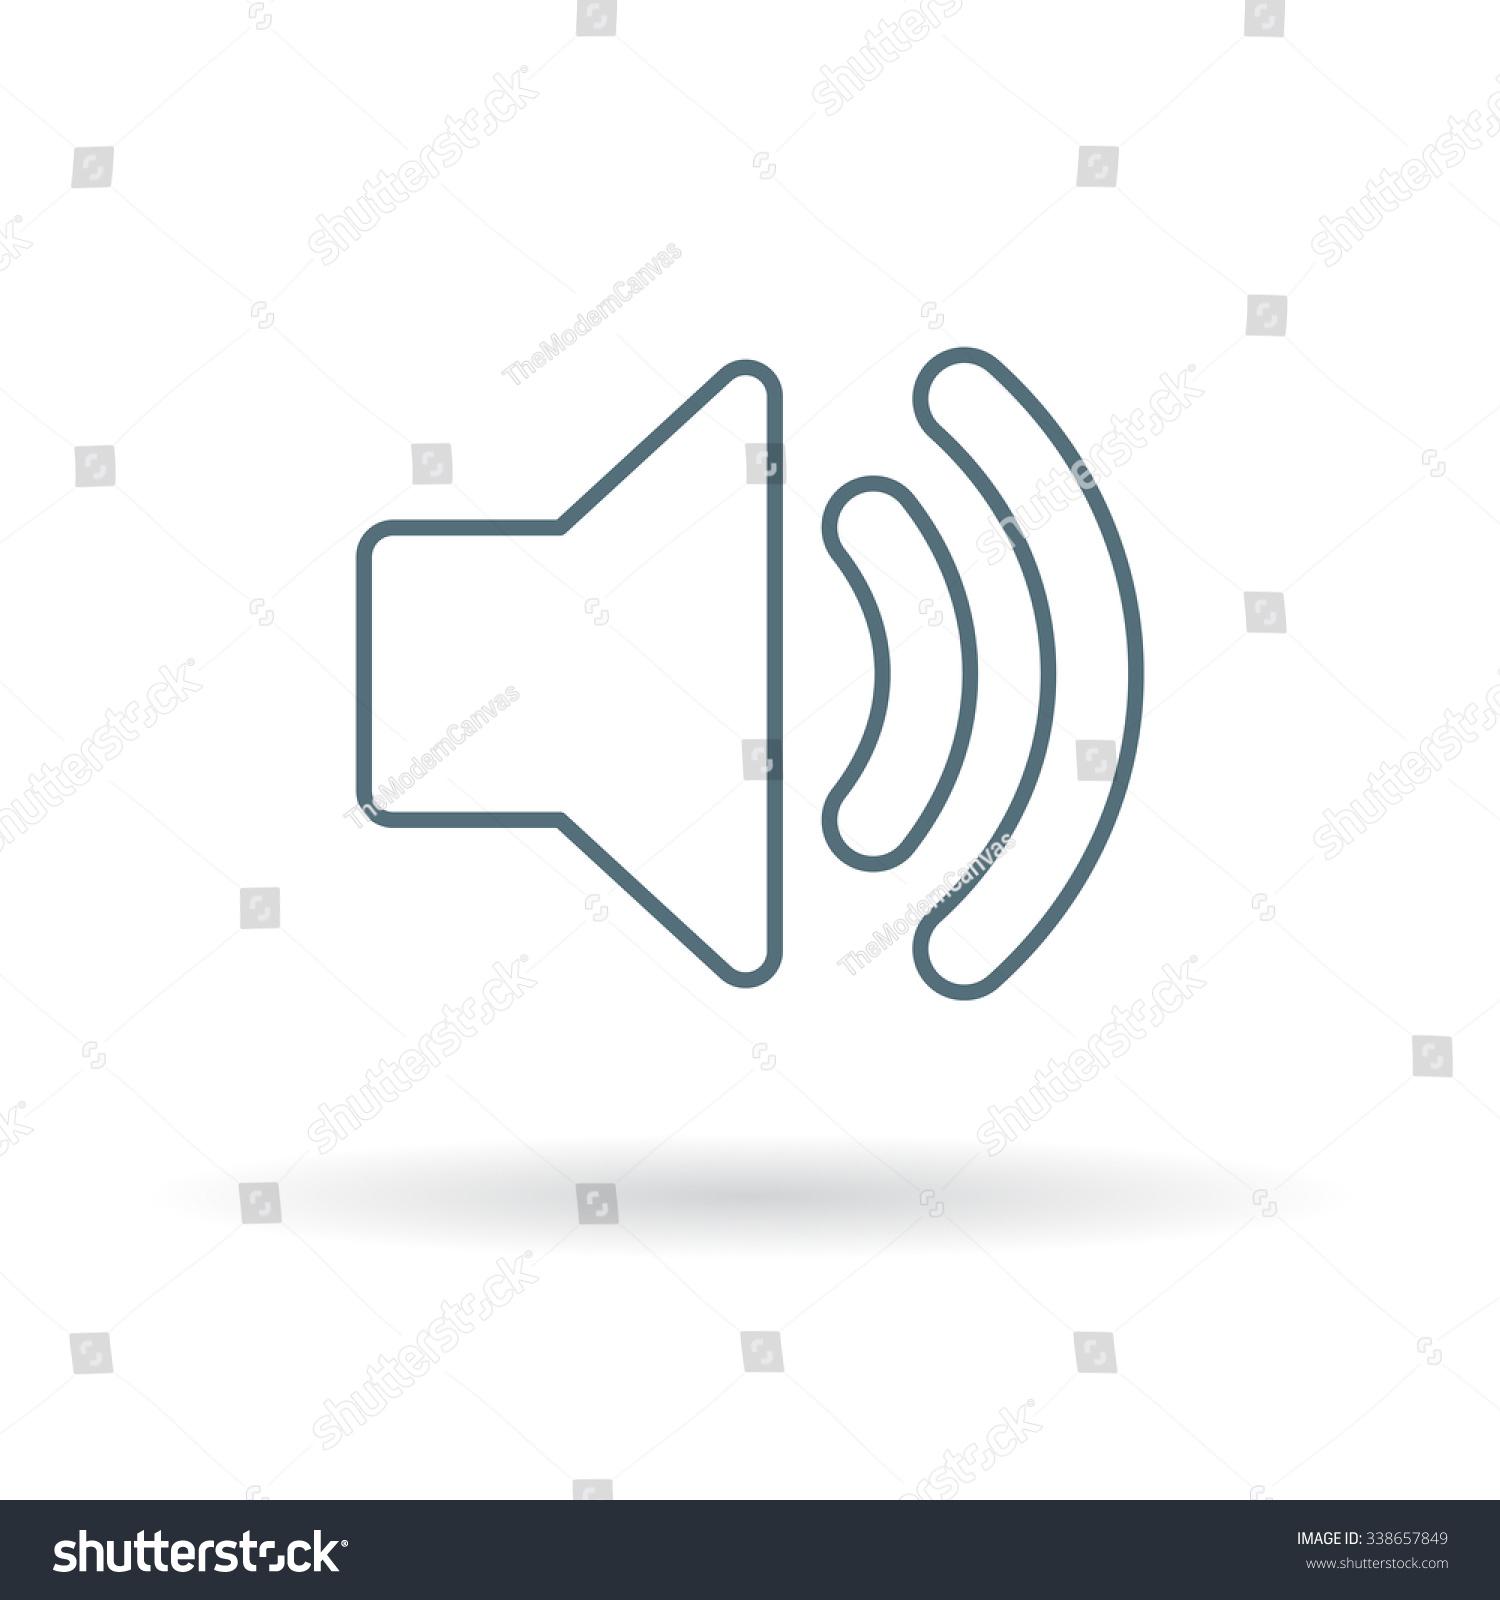 Nice Speaker Symbol Crest - Simple Wiring Diagram - littleforestgirl.net